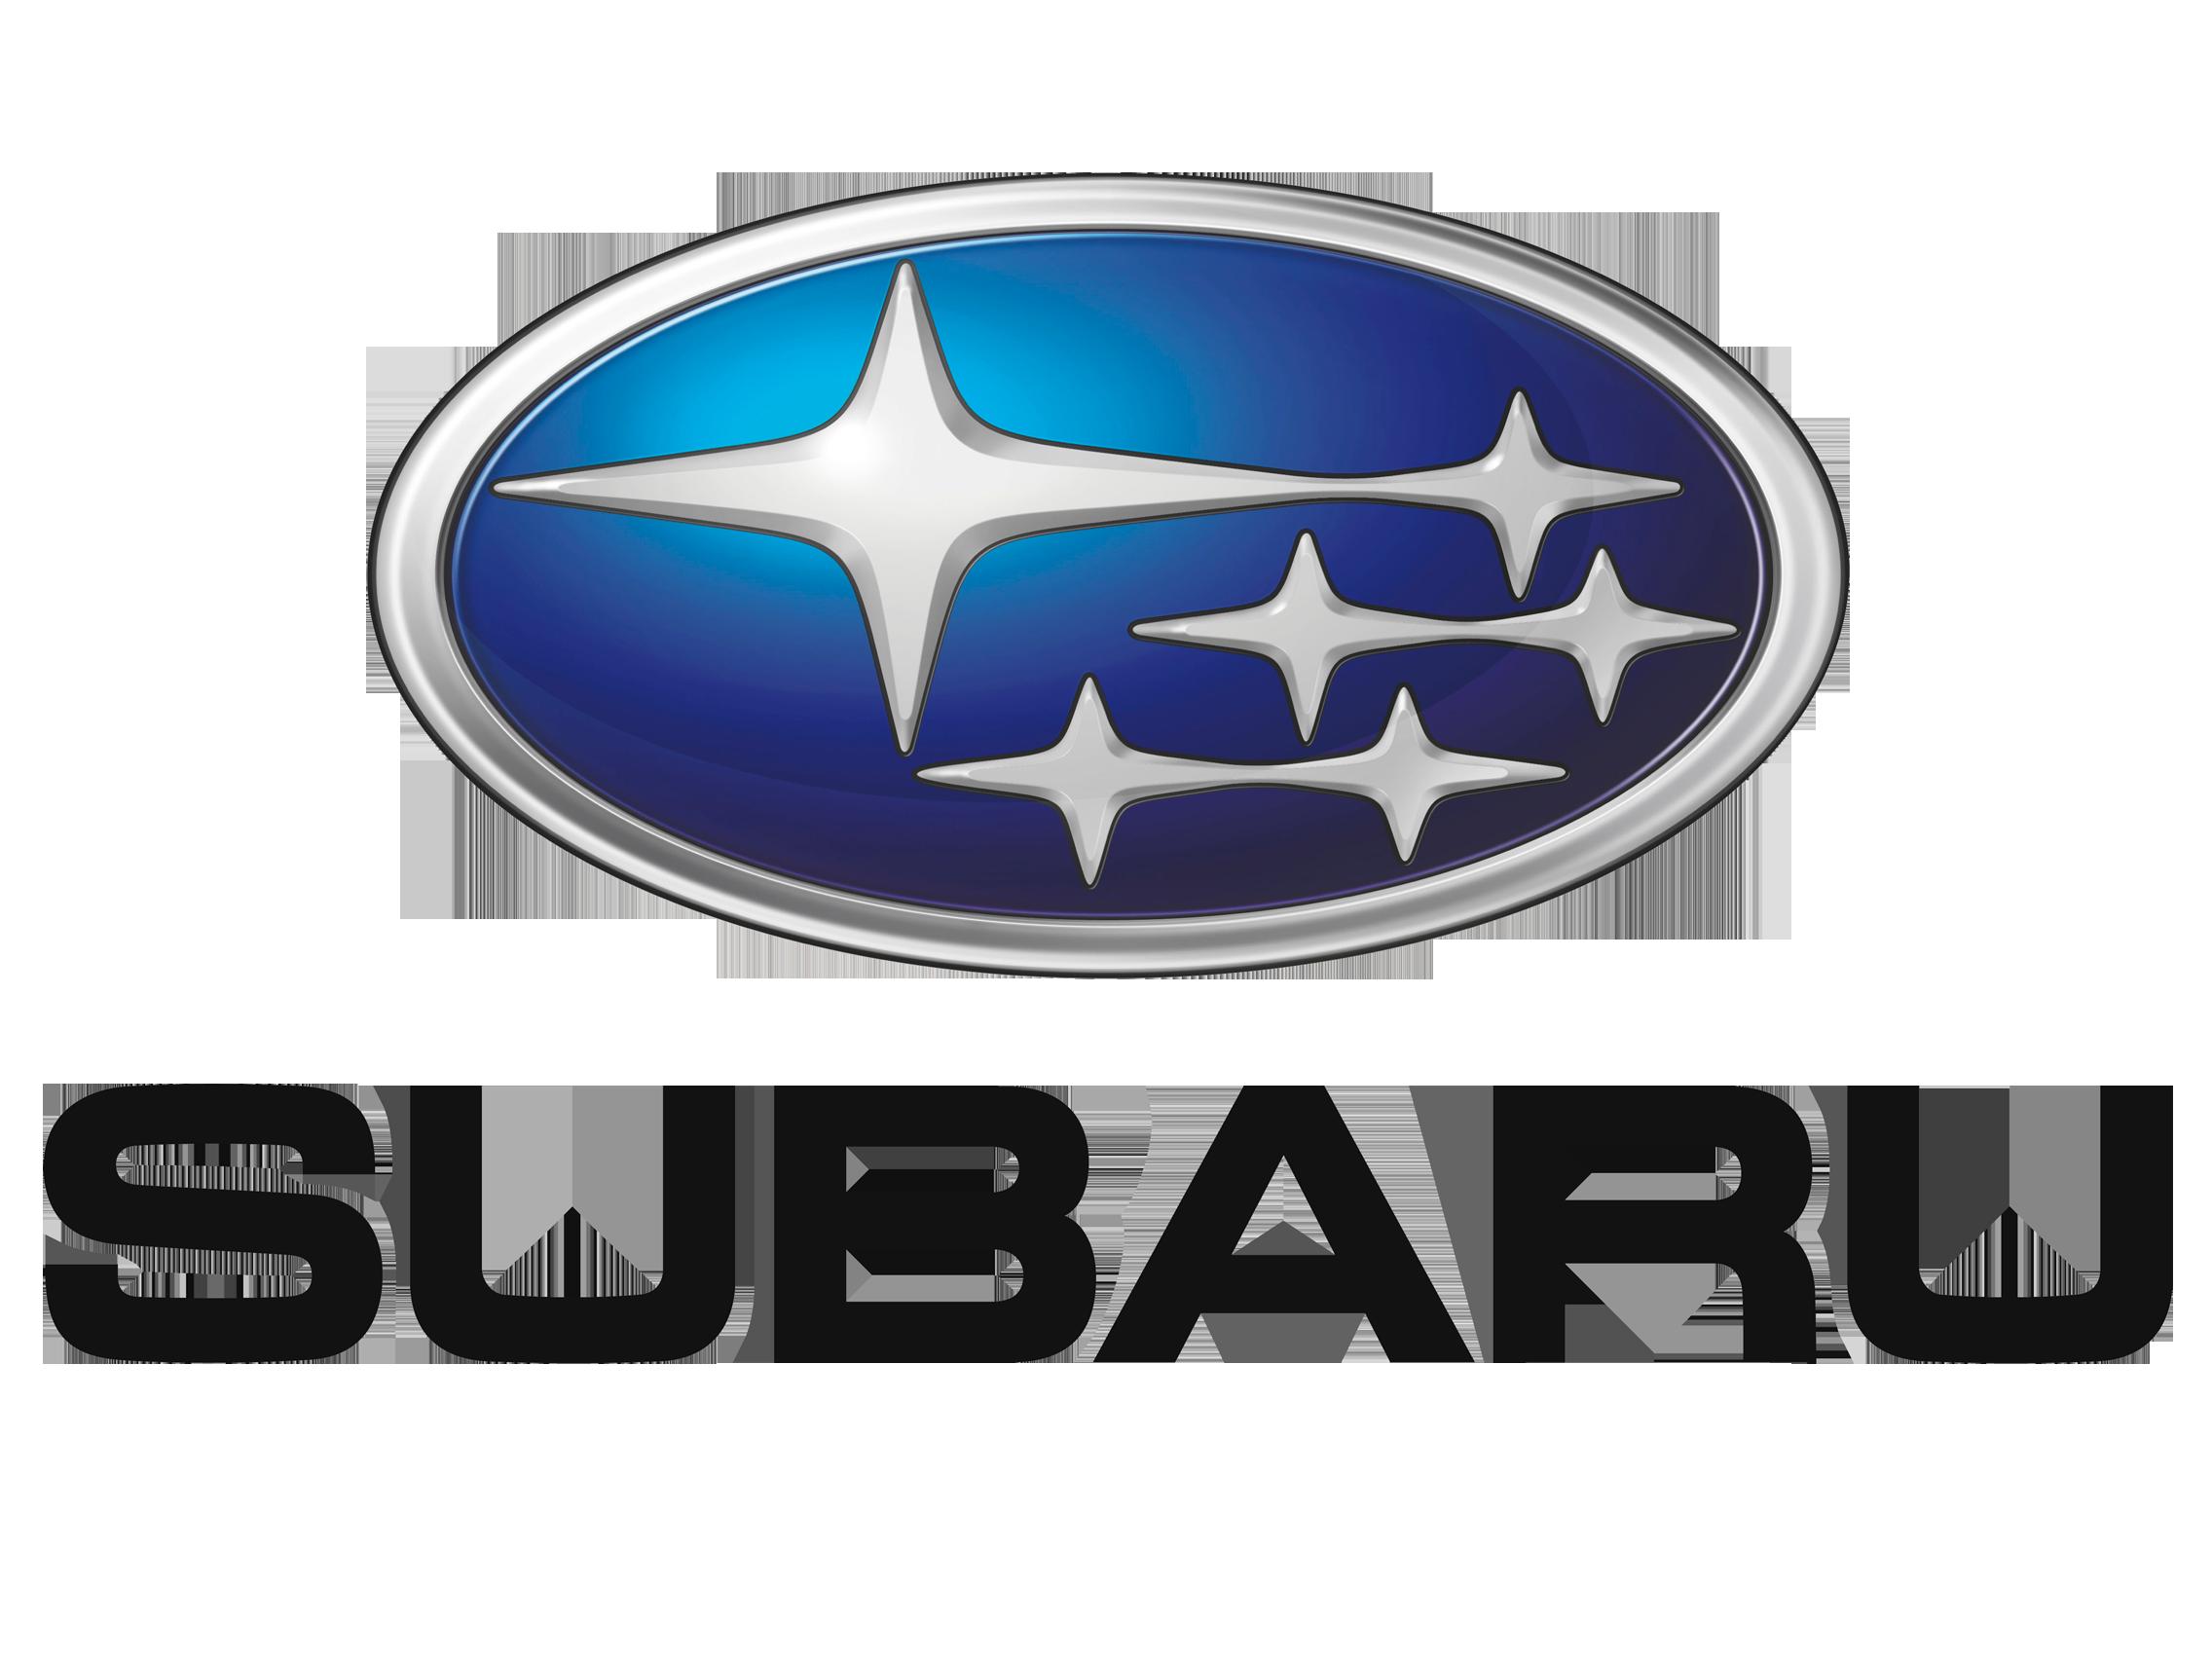 Subaru-logo-and-wordmark.png